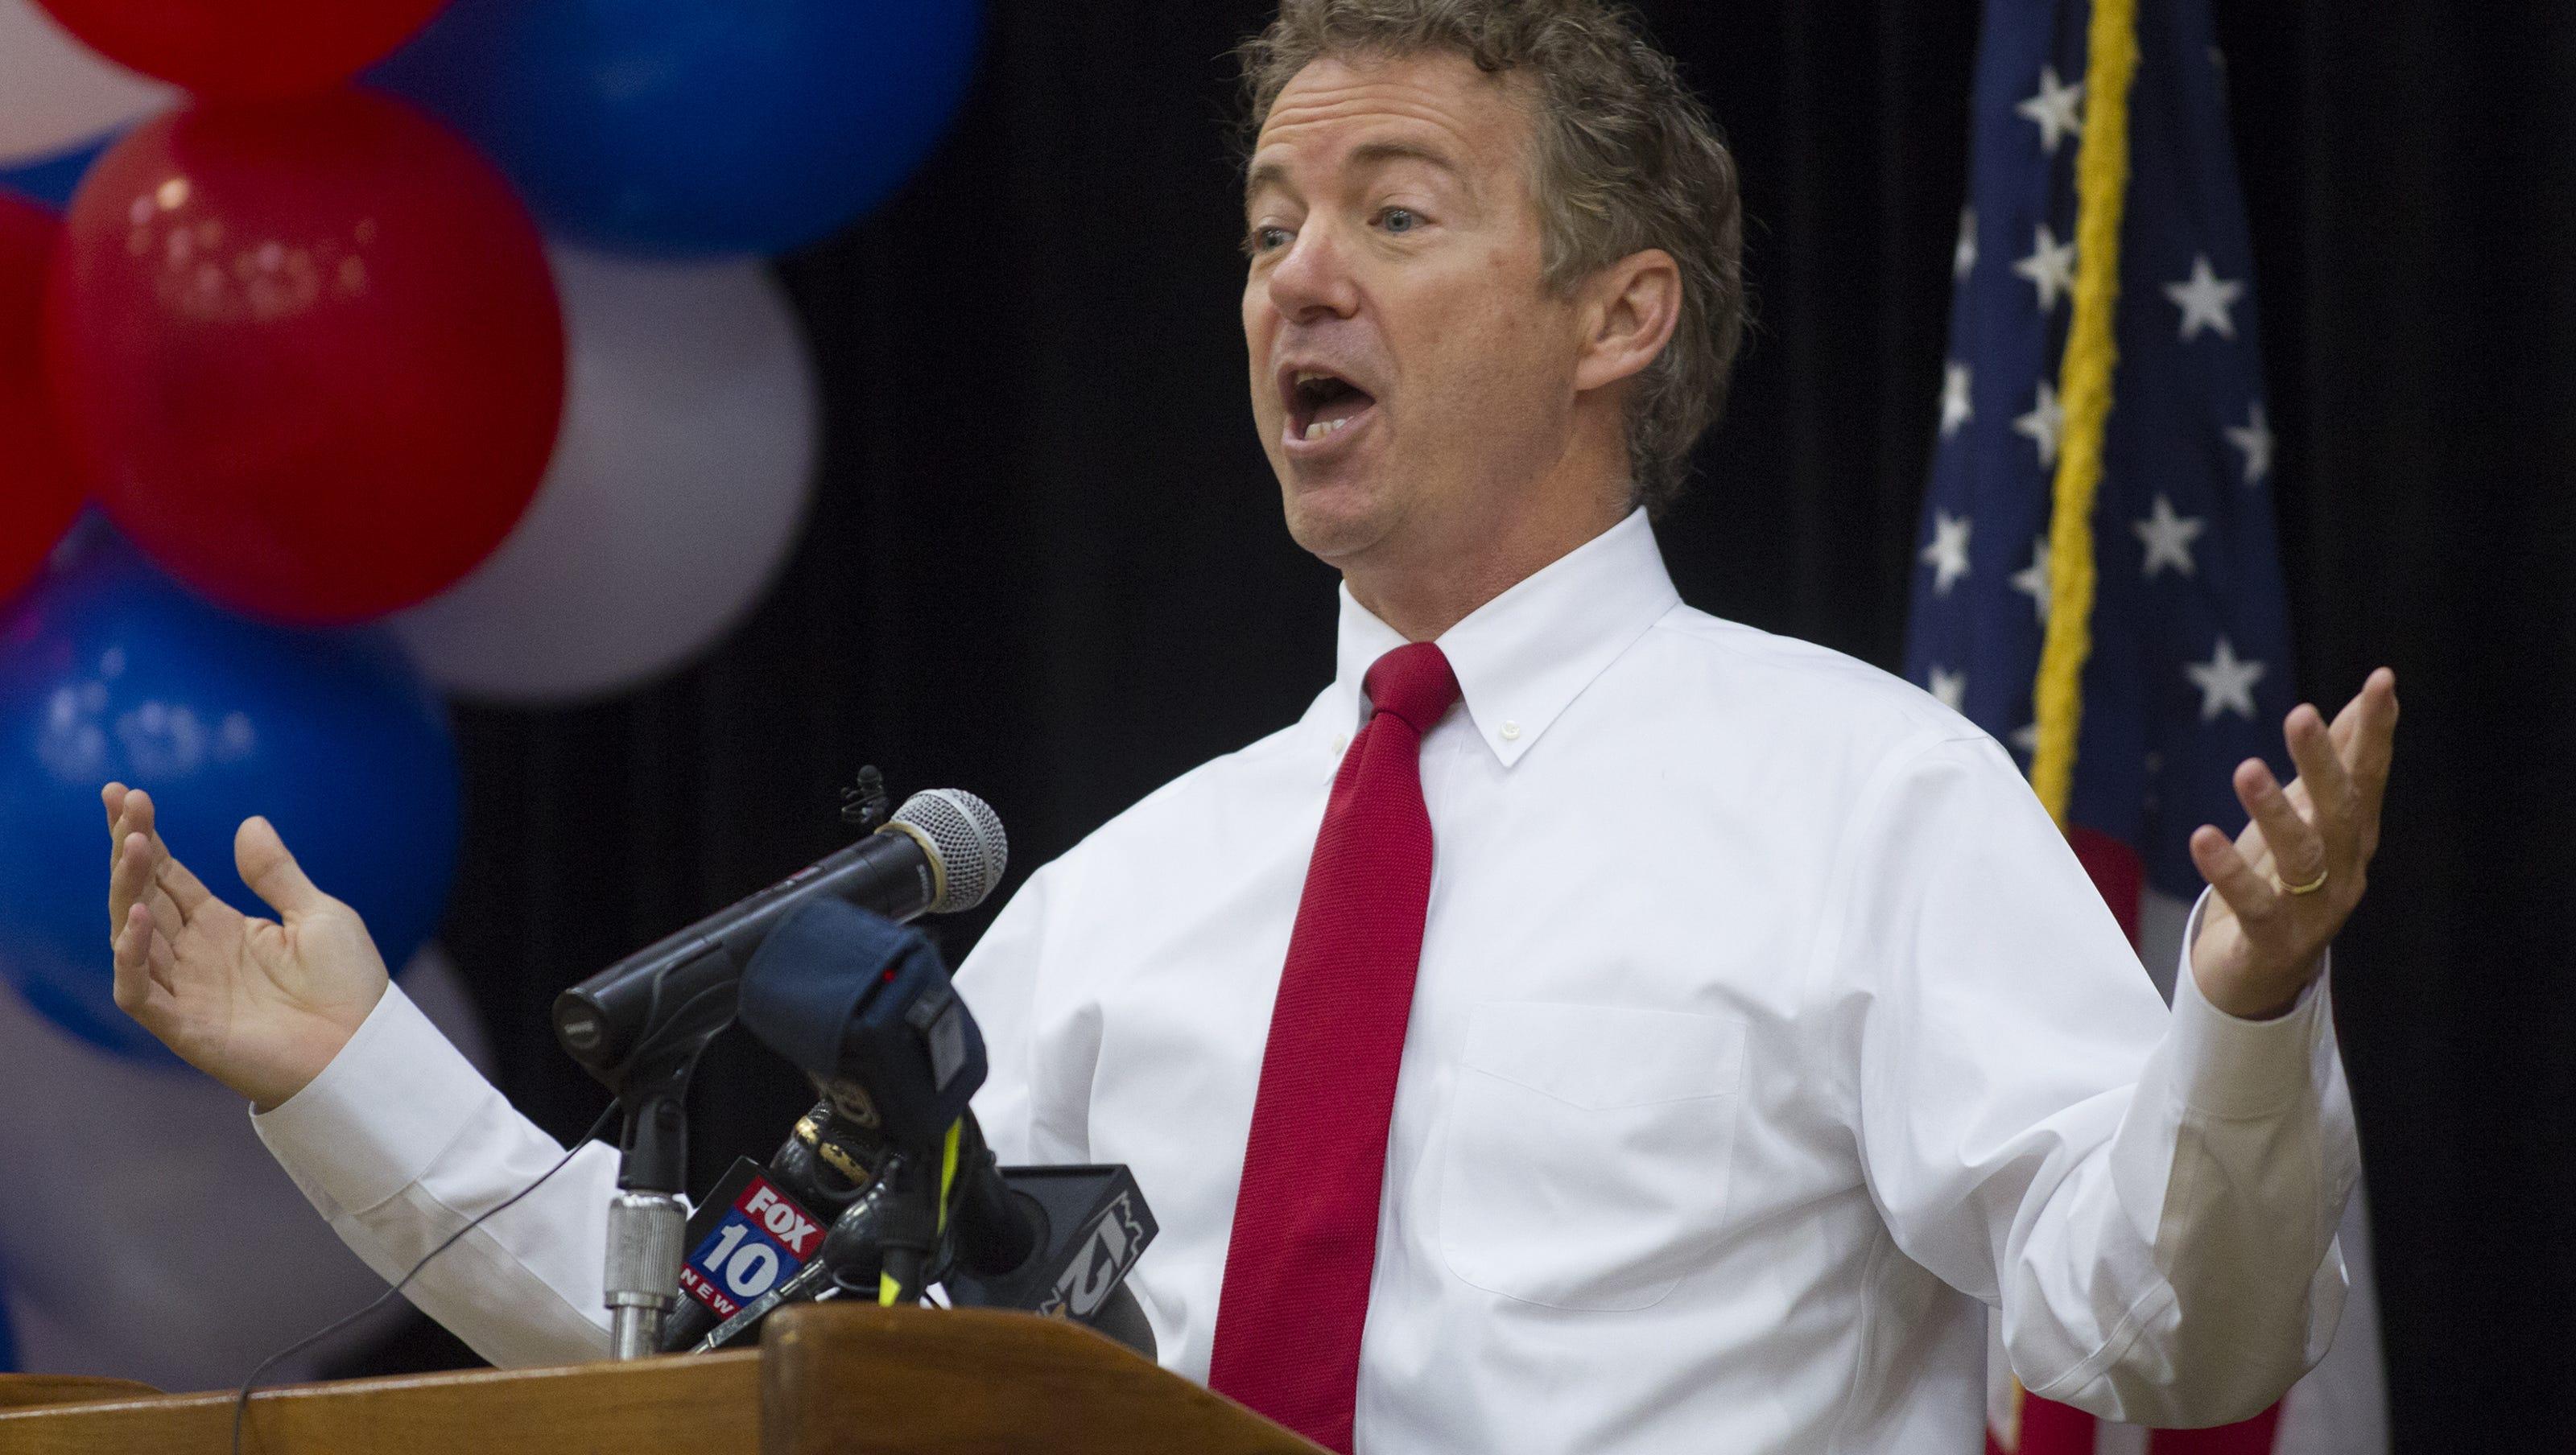 Cheers To Senator Rand Paul >> Rand Paul cheers NSA ruling, swipes at McCain in Arizona visit